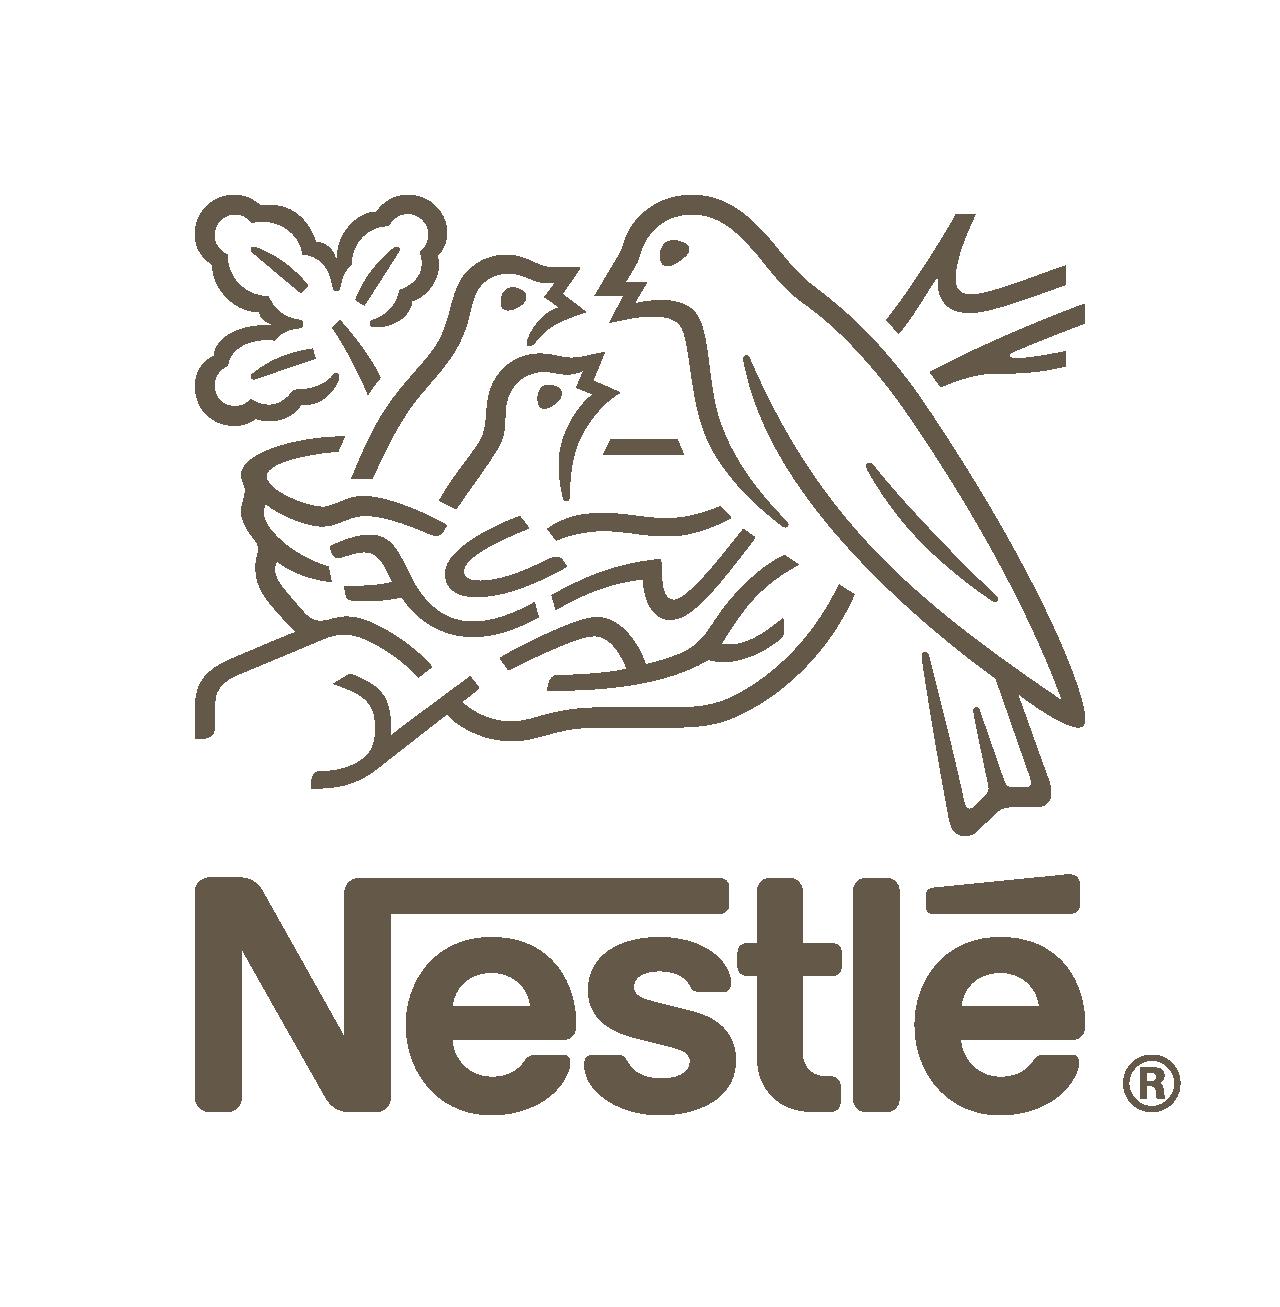 https://europeanplasticspact.org/wp-content/uploads/2021/05/nestle_logo.png